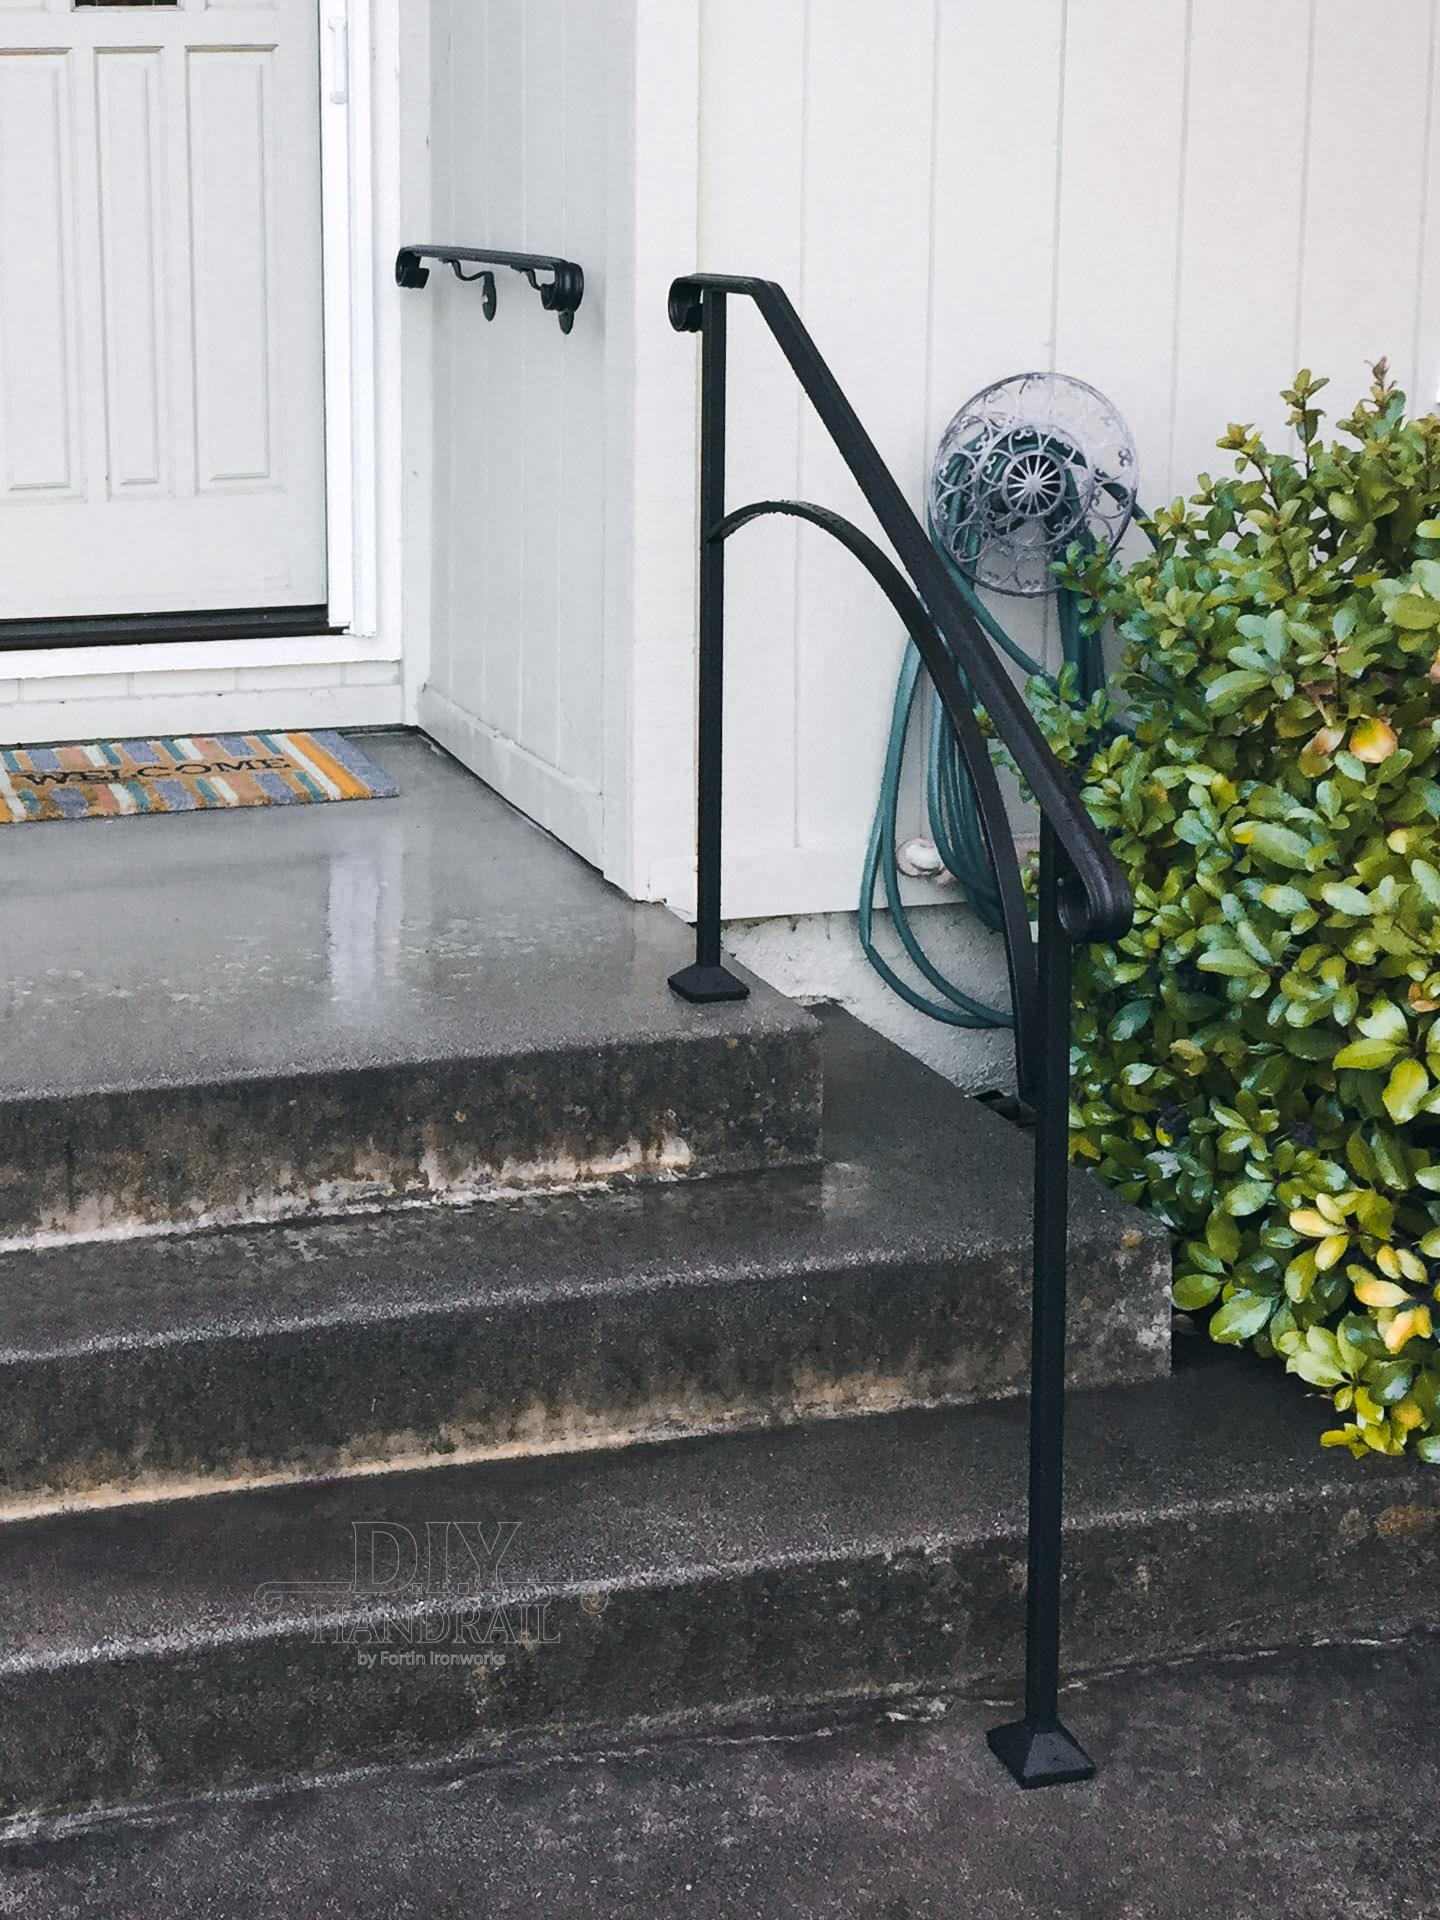 Wrought Iron Outdoor Handrails Custom Handmade Railings   Iron Handrails For Outdoor Steps   Antique   Deck   Front Door   Entrance   Ornamental